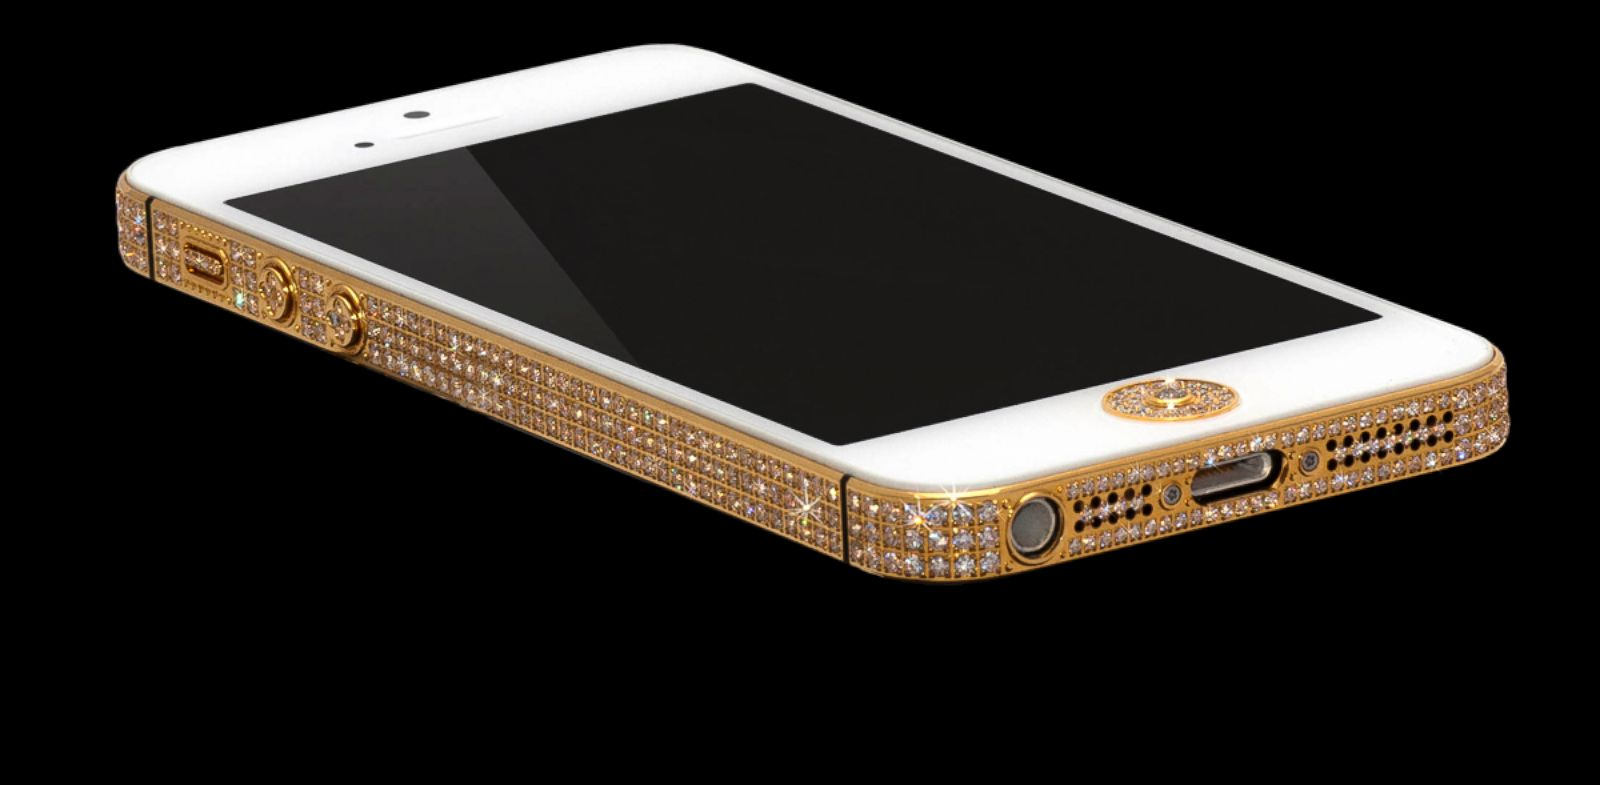 million dollar iphone 5 abc news